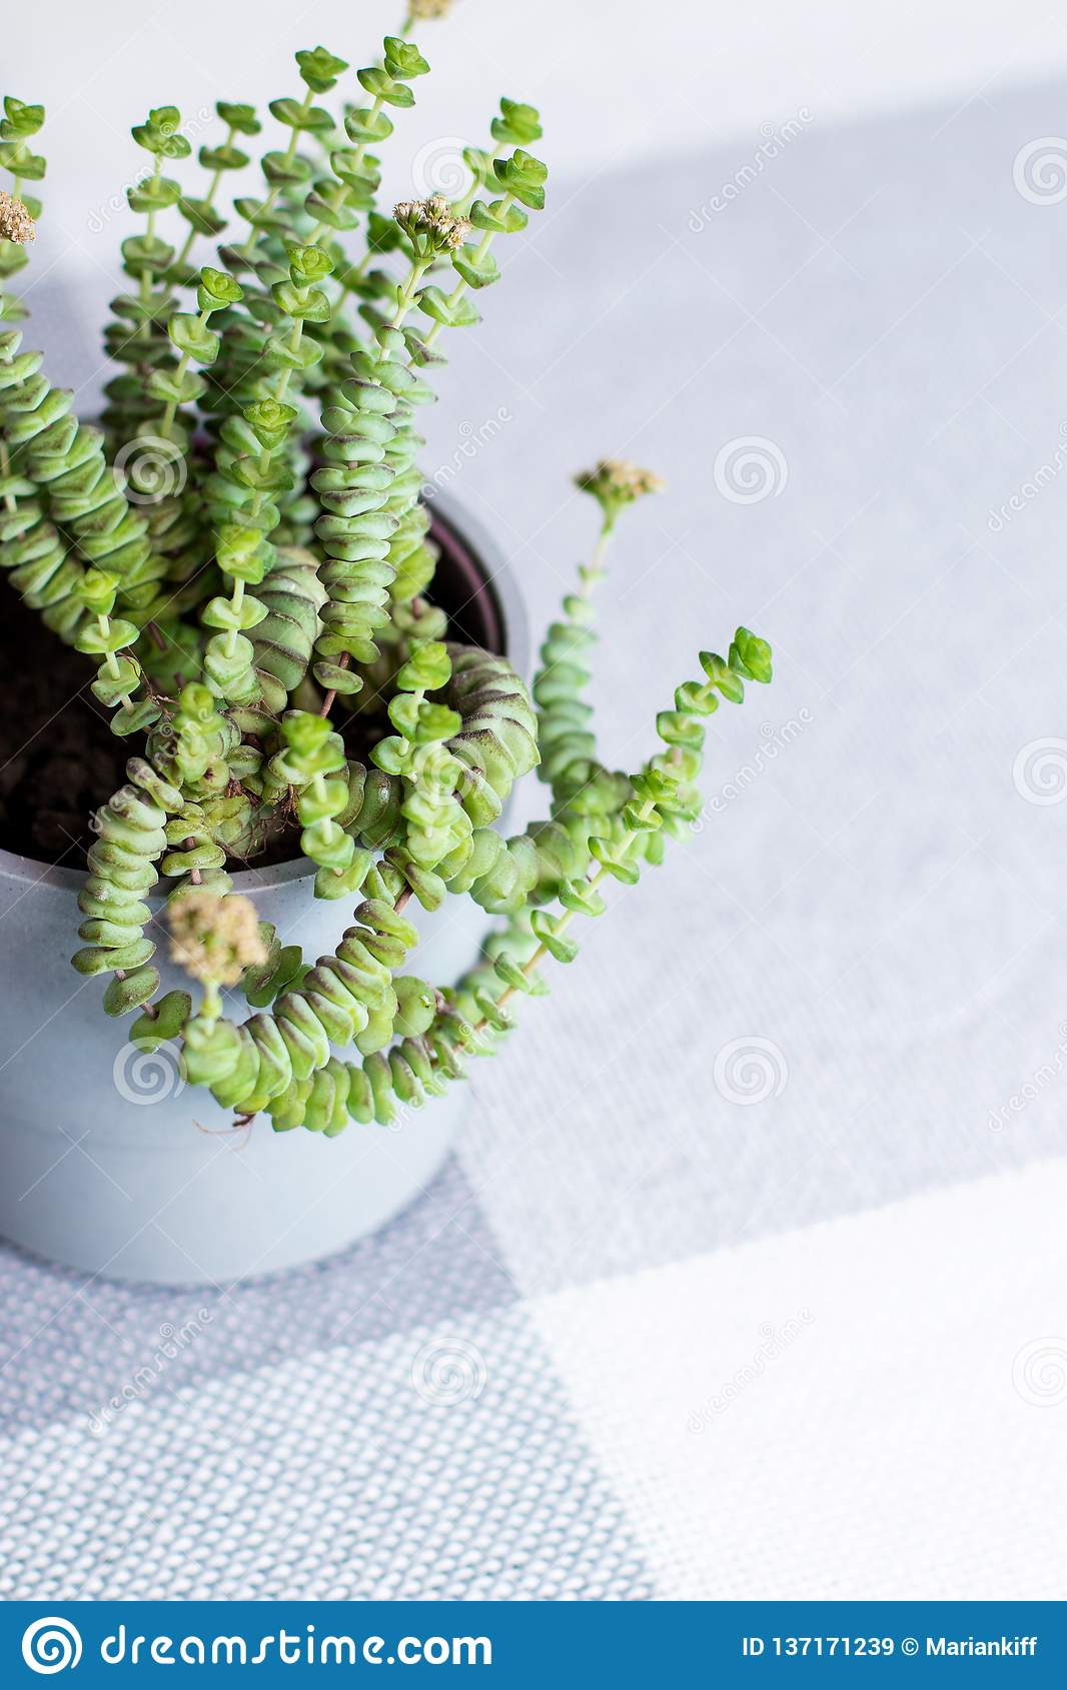 Green Flower Crassula Nealeana Rare Succulent Plant In A Grey Pot Home Interior Decoration Concept Stock Image Image Of Desert Cotyledon 137171239